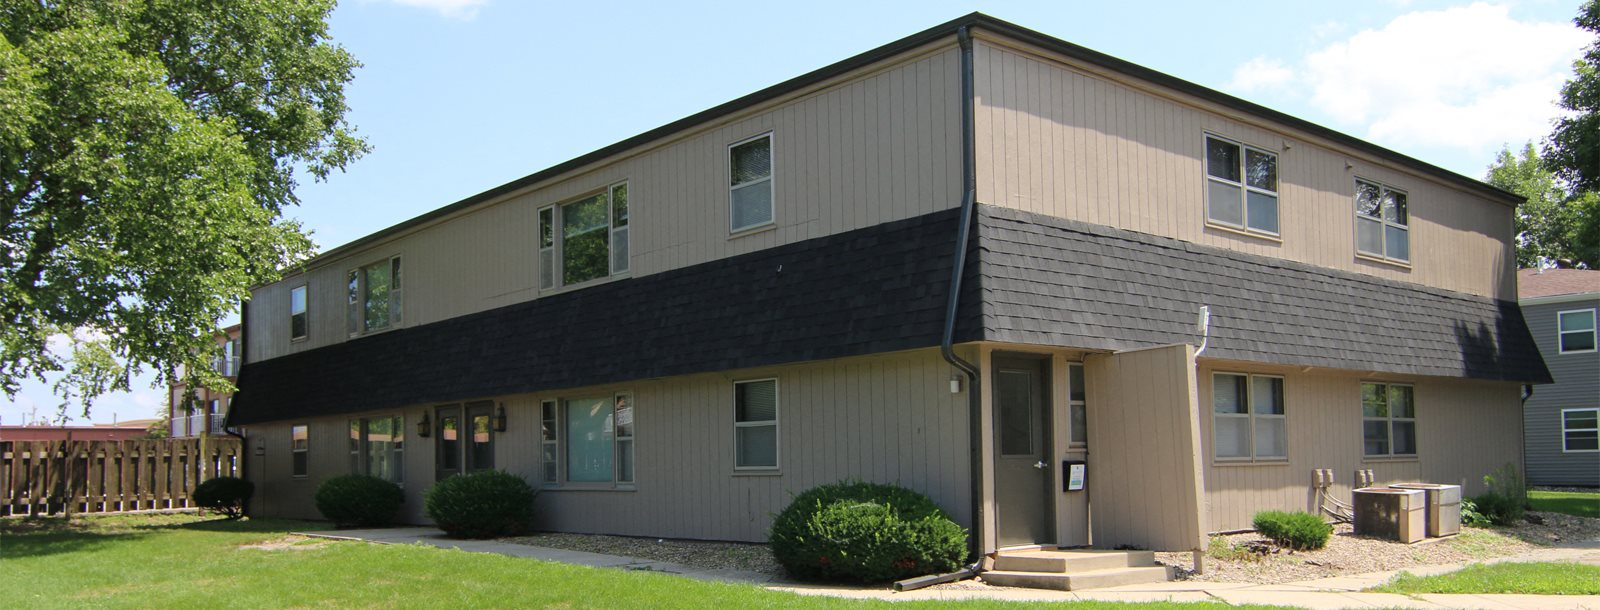 Exteriors-South-View-Apartments-Ames-Iowa-courtyard